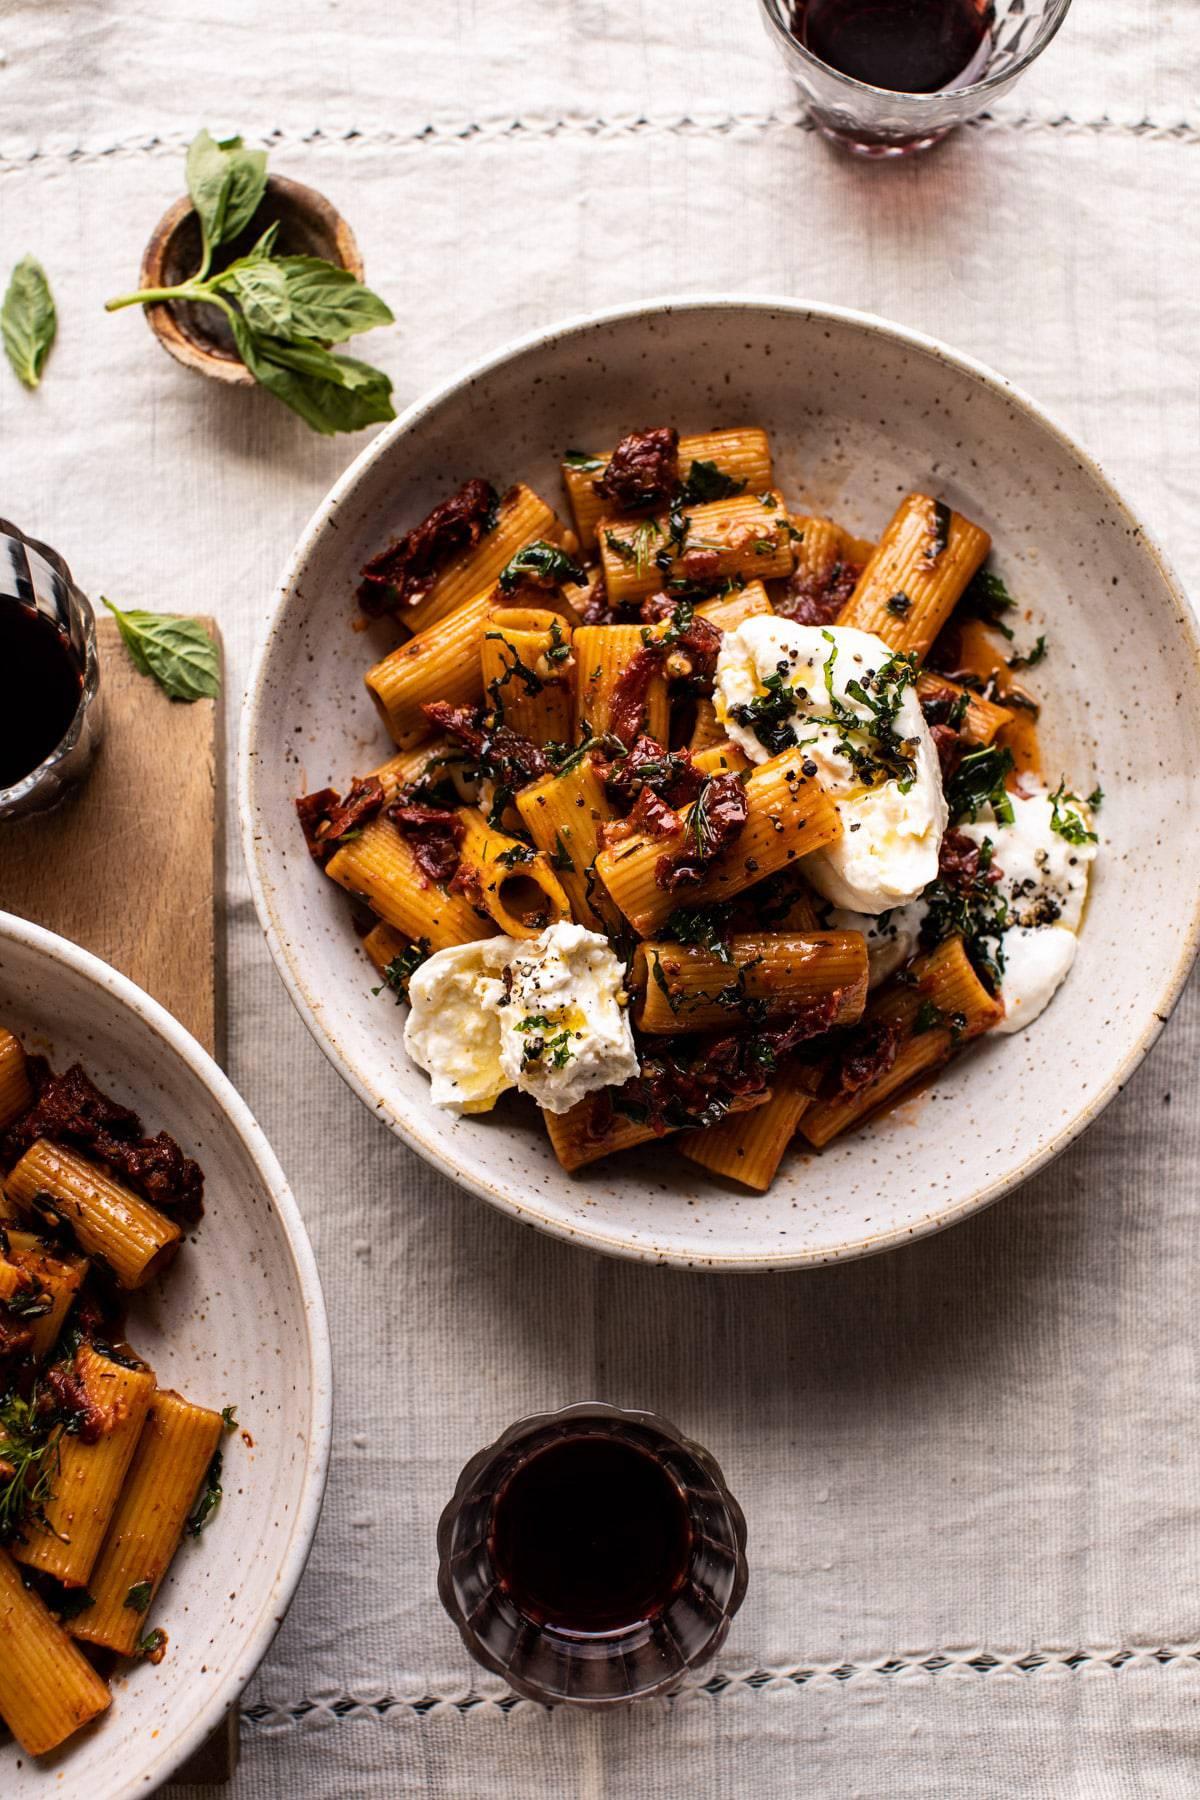 Quick Pantry Pasta withSun-Dried Tomatoes and Burrata | halfbakedharvest.com #pasta #pantrypasta #easyrecipes #Italian #dinner